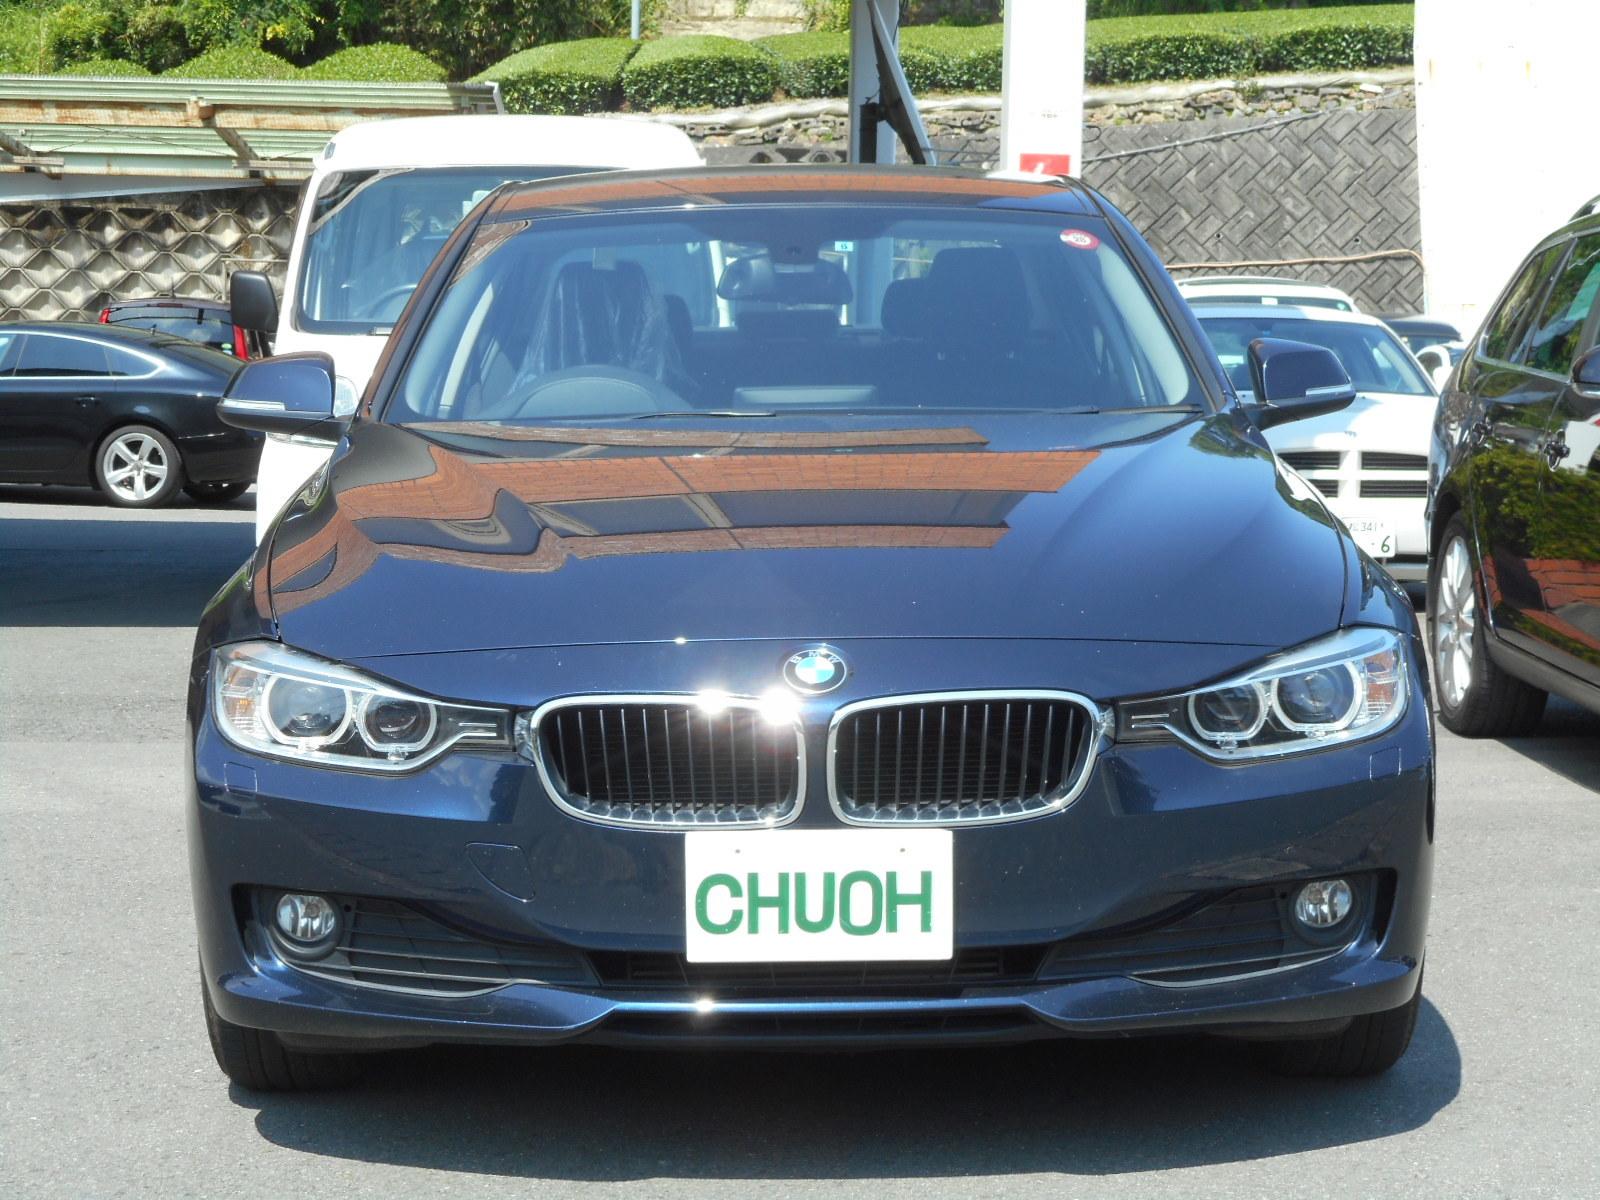 BMW 320d入りました!_c0267693_17521315.jpg